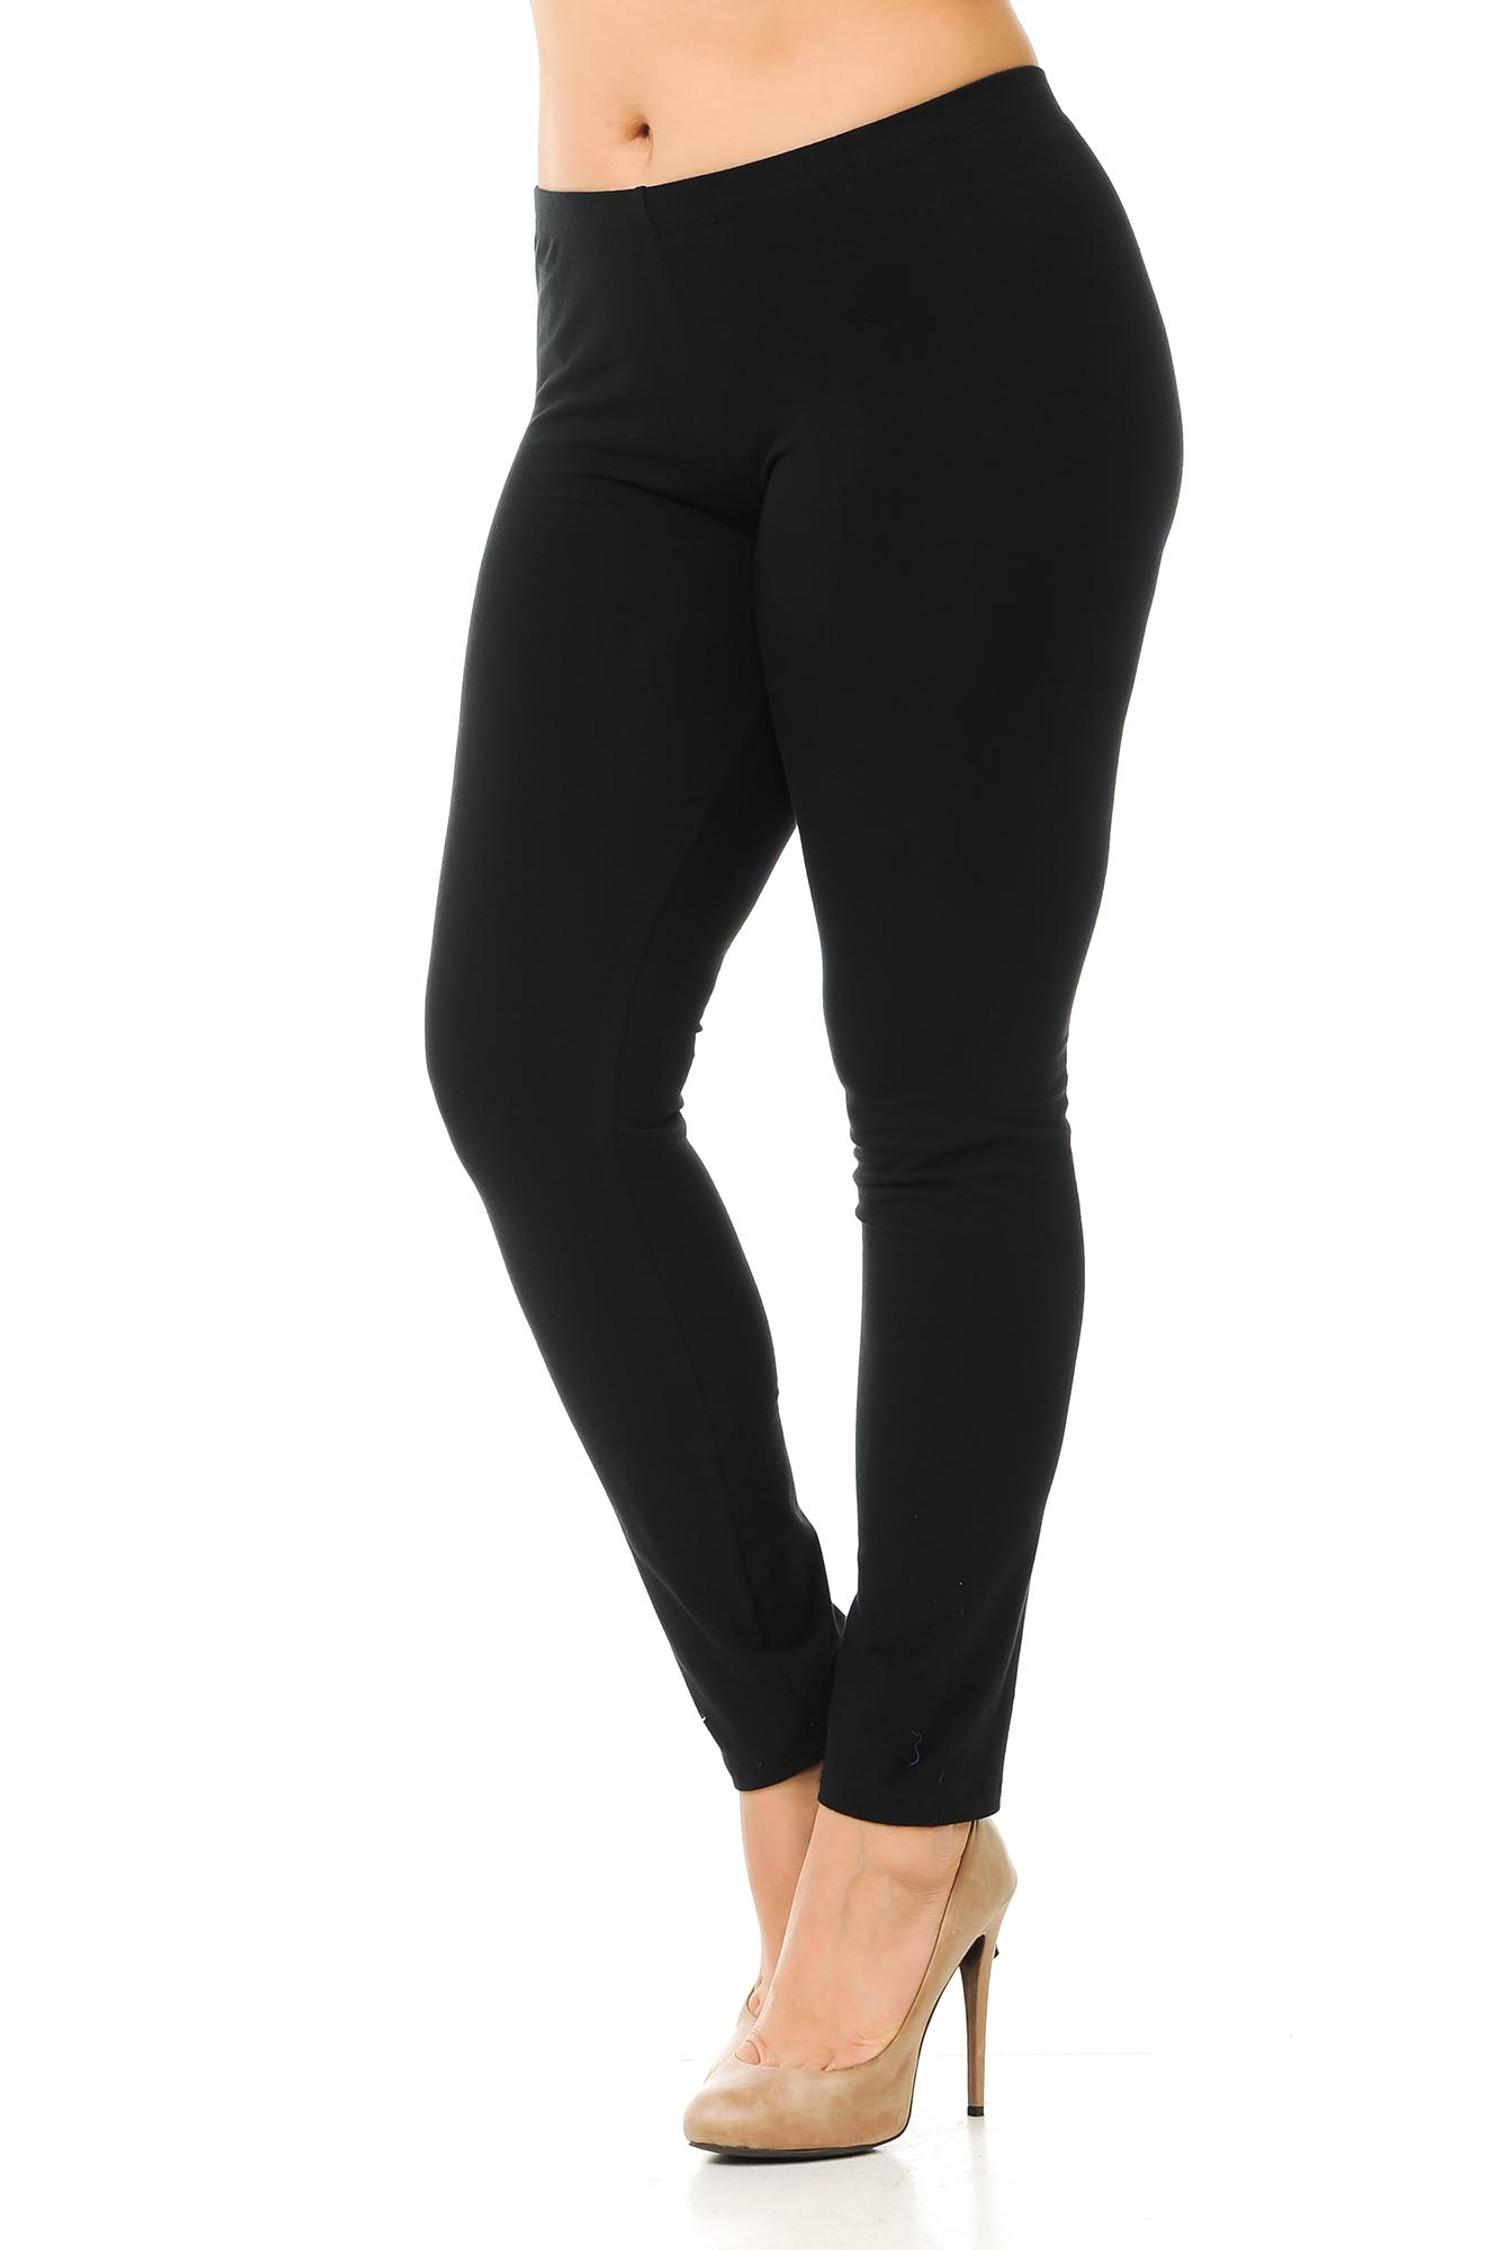 45 degree angled view of black plus size qUSA Cotton Full Length Leggings